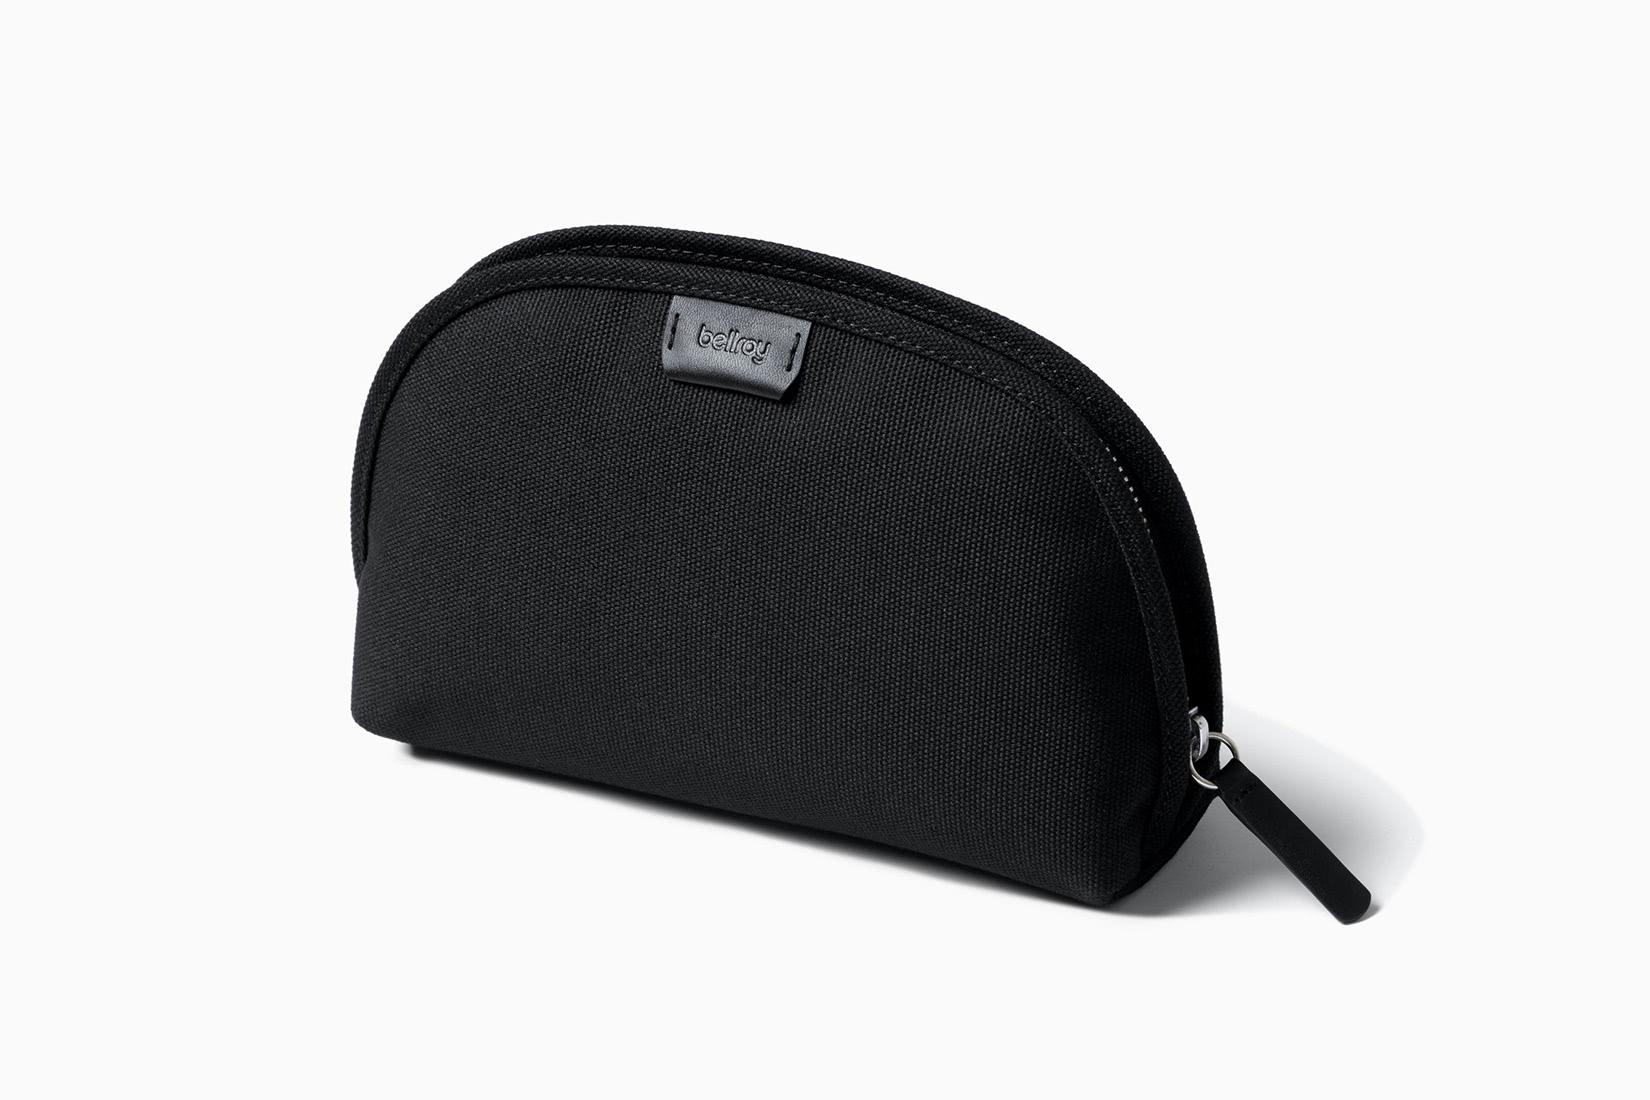 best toiletry bag women small compact bellroy - Luxe Digital